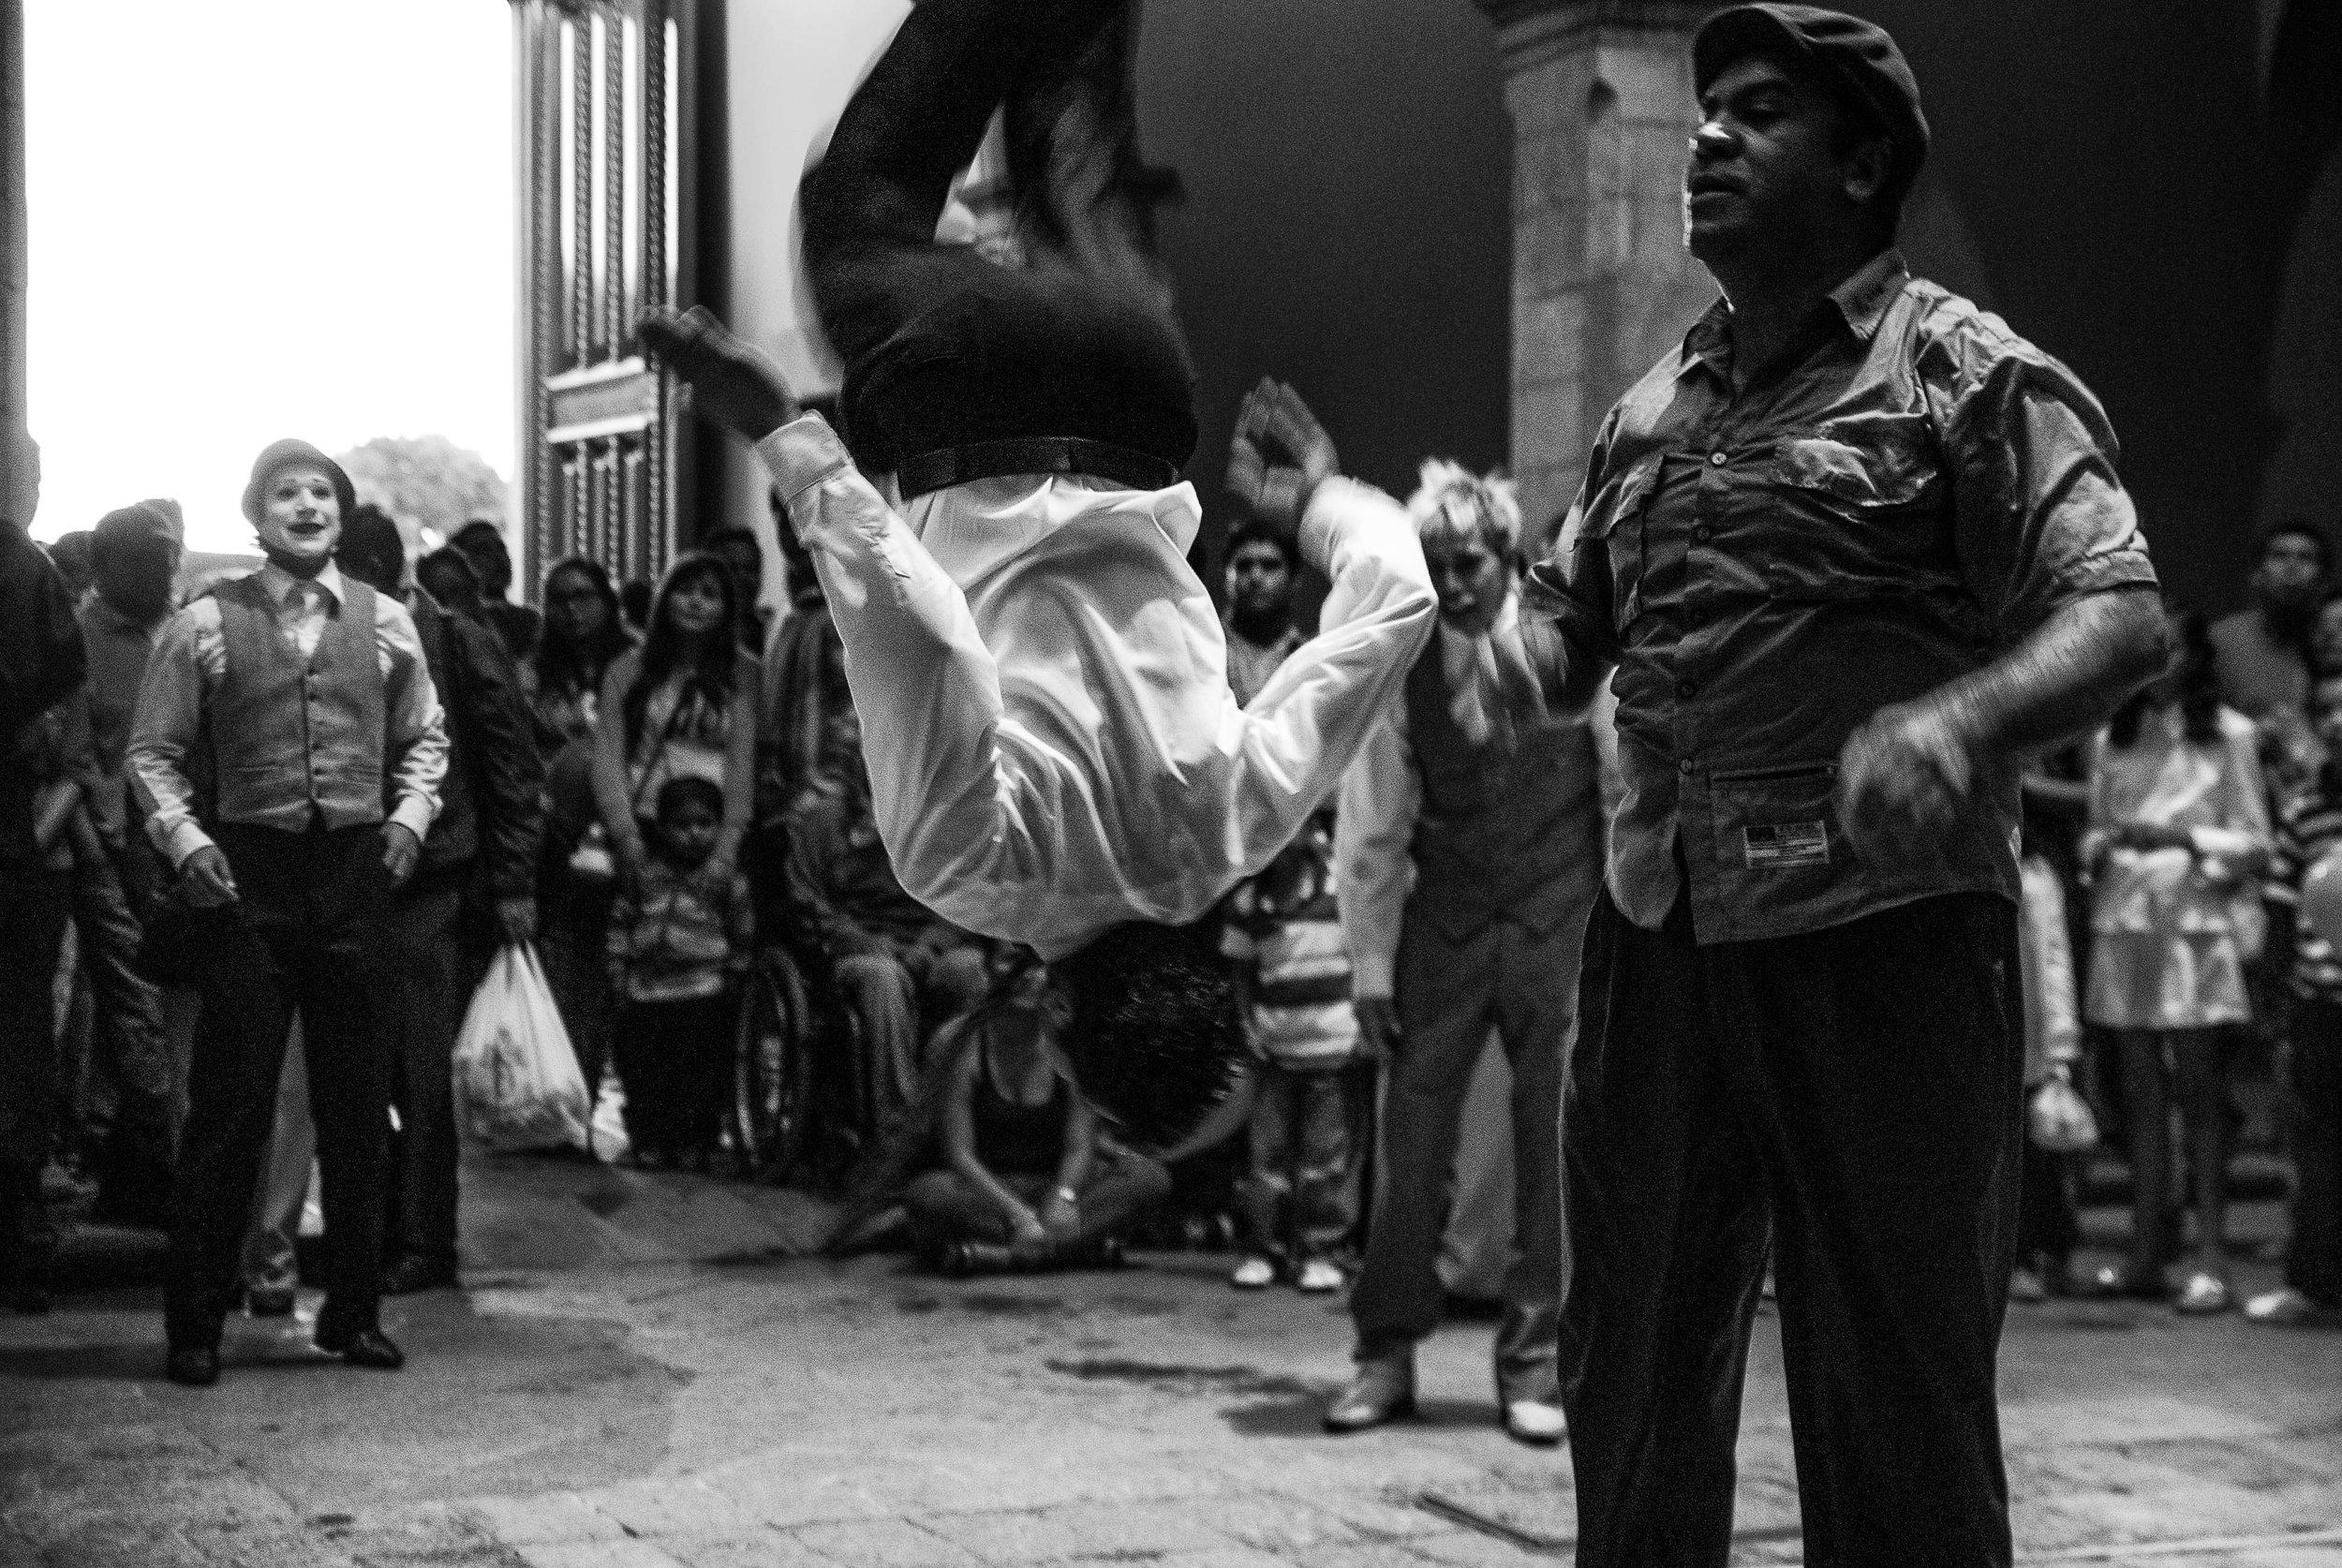 Circo urbano